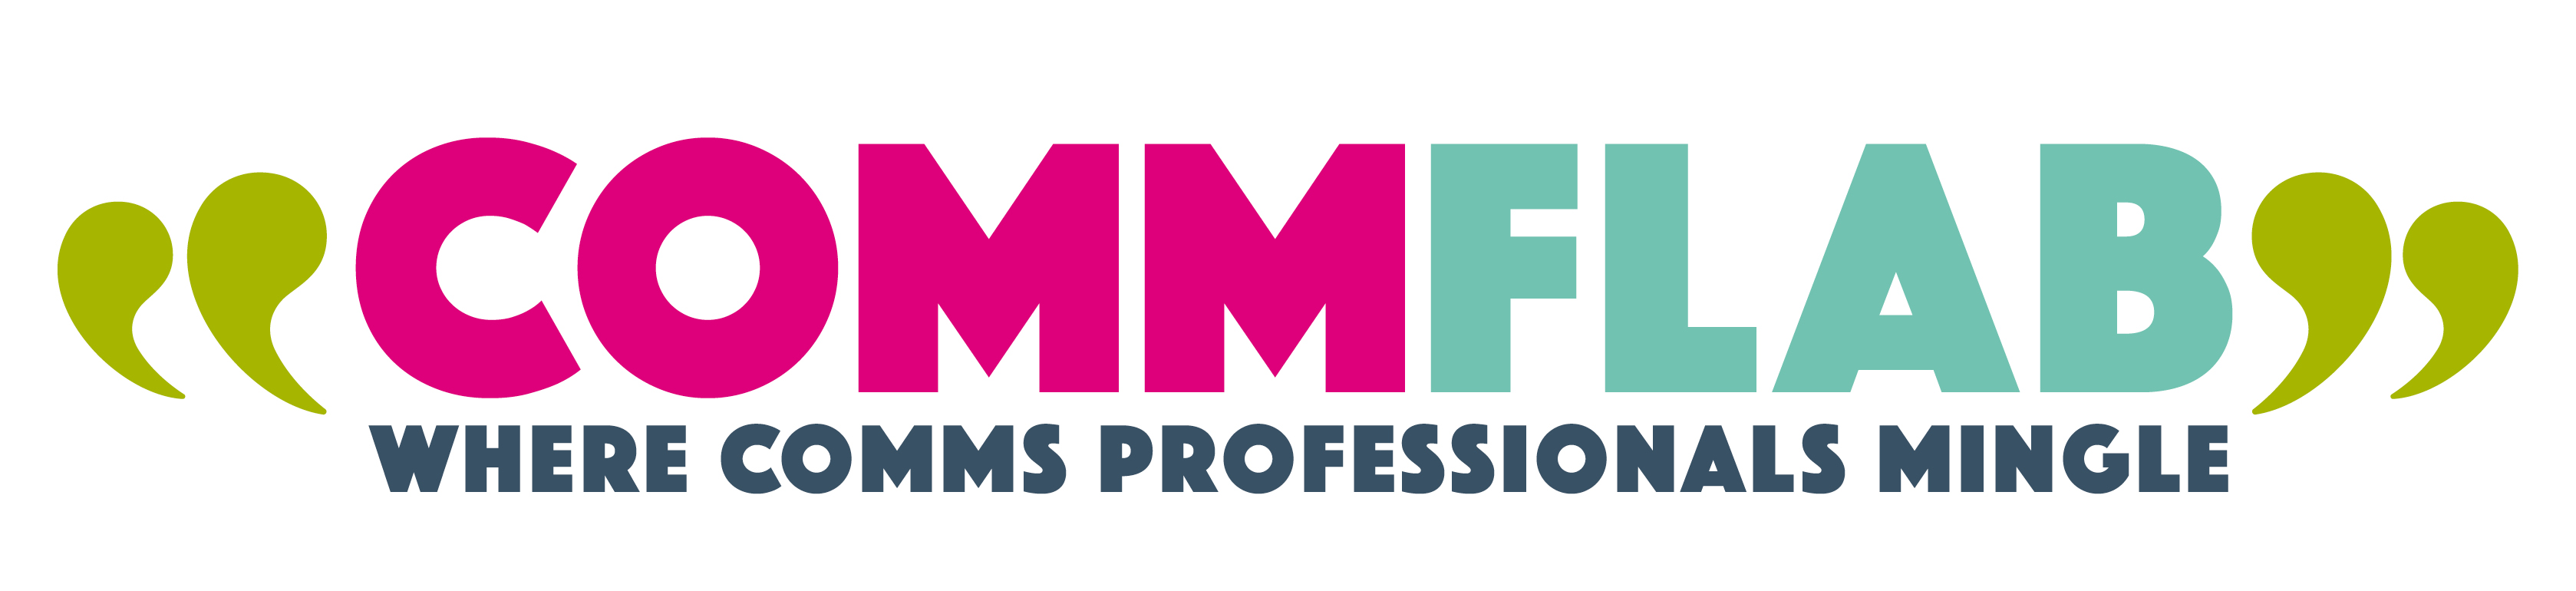 CommFlab logo high quality